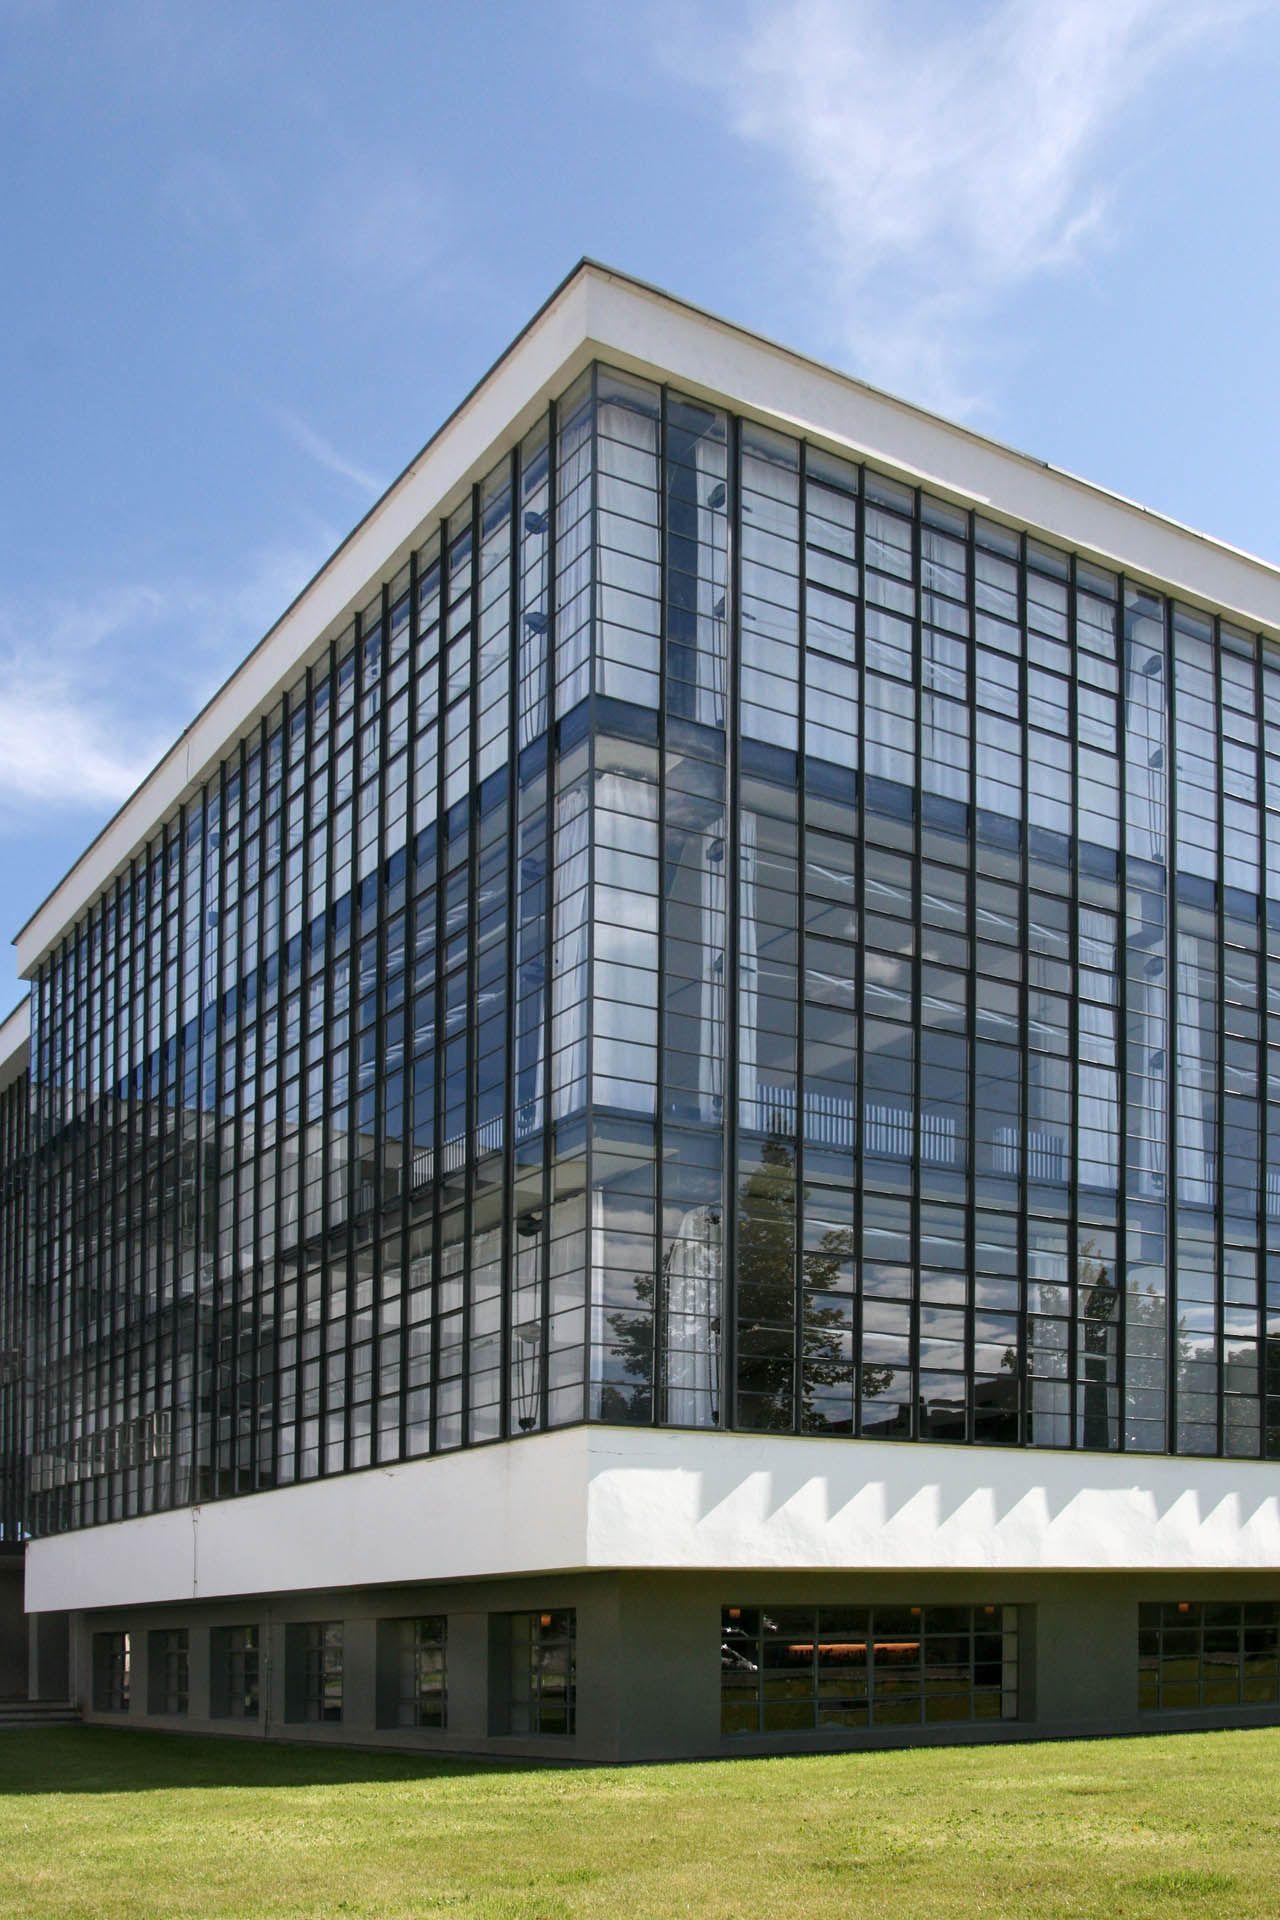 Bauhaus buildings, Dessau ©Christin Irrgang, 2011, Stiftung Bauhaus Dessau